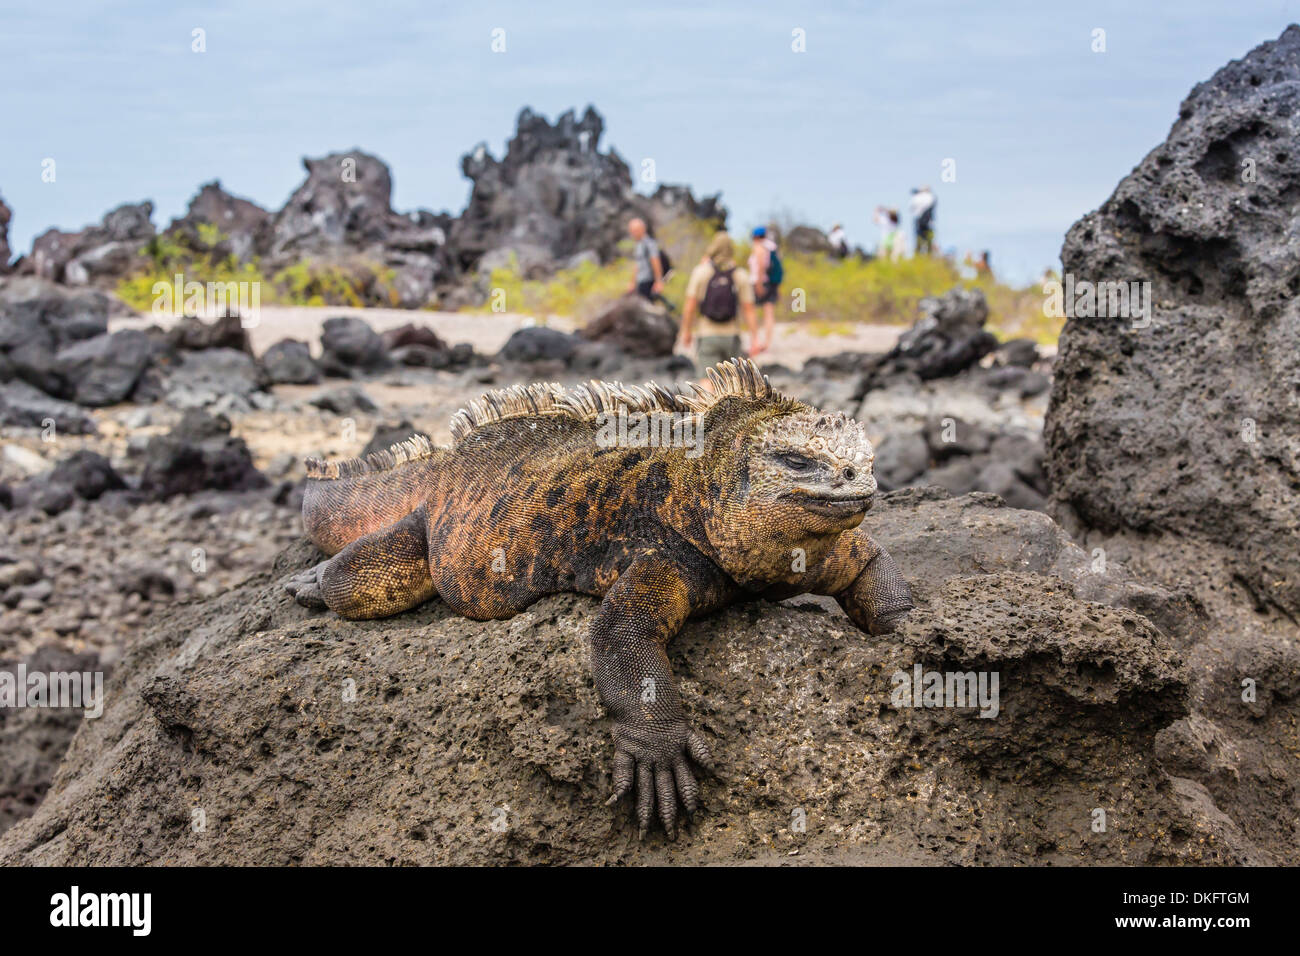 Galapagos marine iguana (Amblyrhynchus cristatus) basking in Urbina Bay, Isabela Island, Galapagos Islands, UNESCO Site, Ecuador - Stock Image